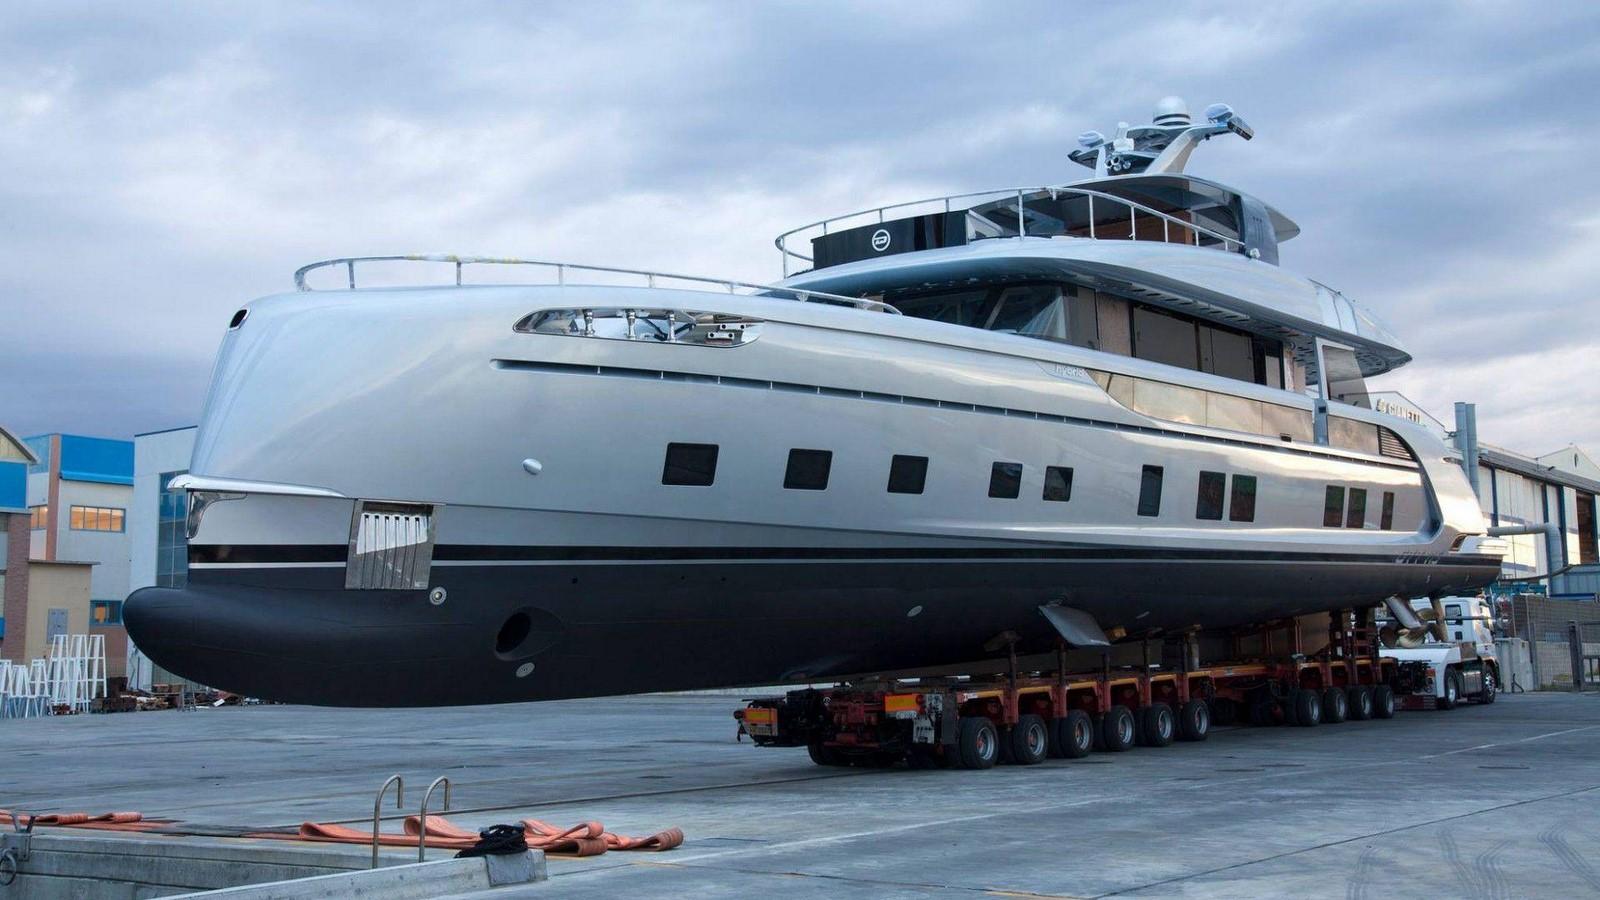 porsche-design-dynamiq-gtt-115-hybrid-superyacht (1)